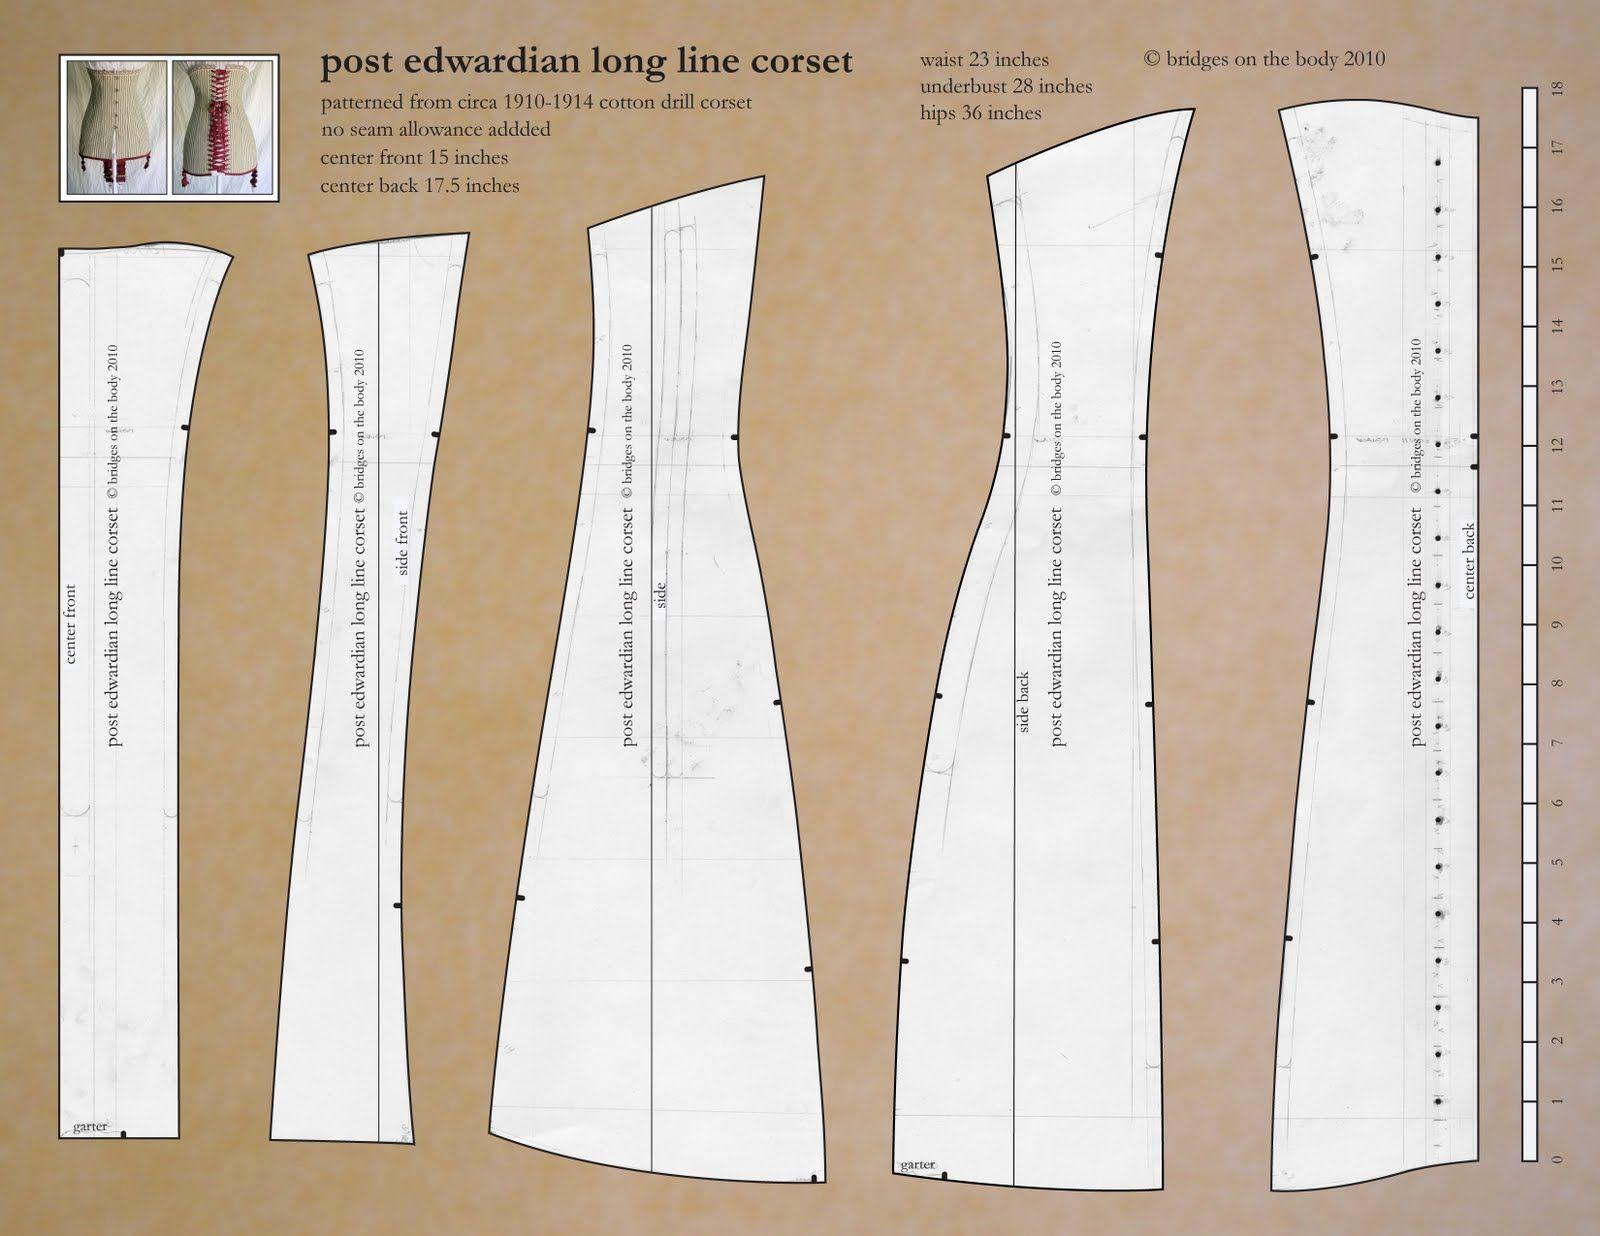 1911 corset pattern | Victorian/Edwardian clothing | Pinterest ...